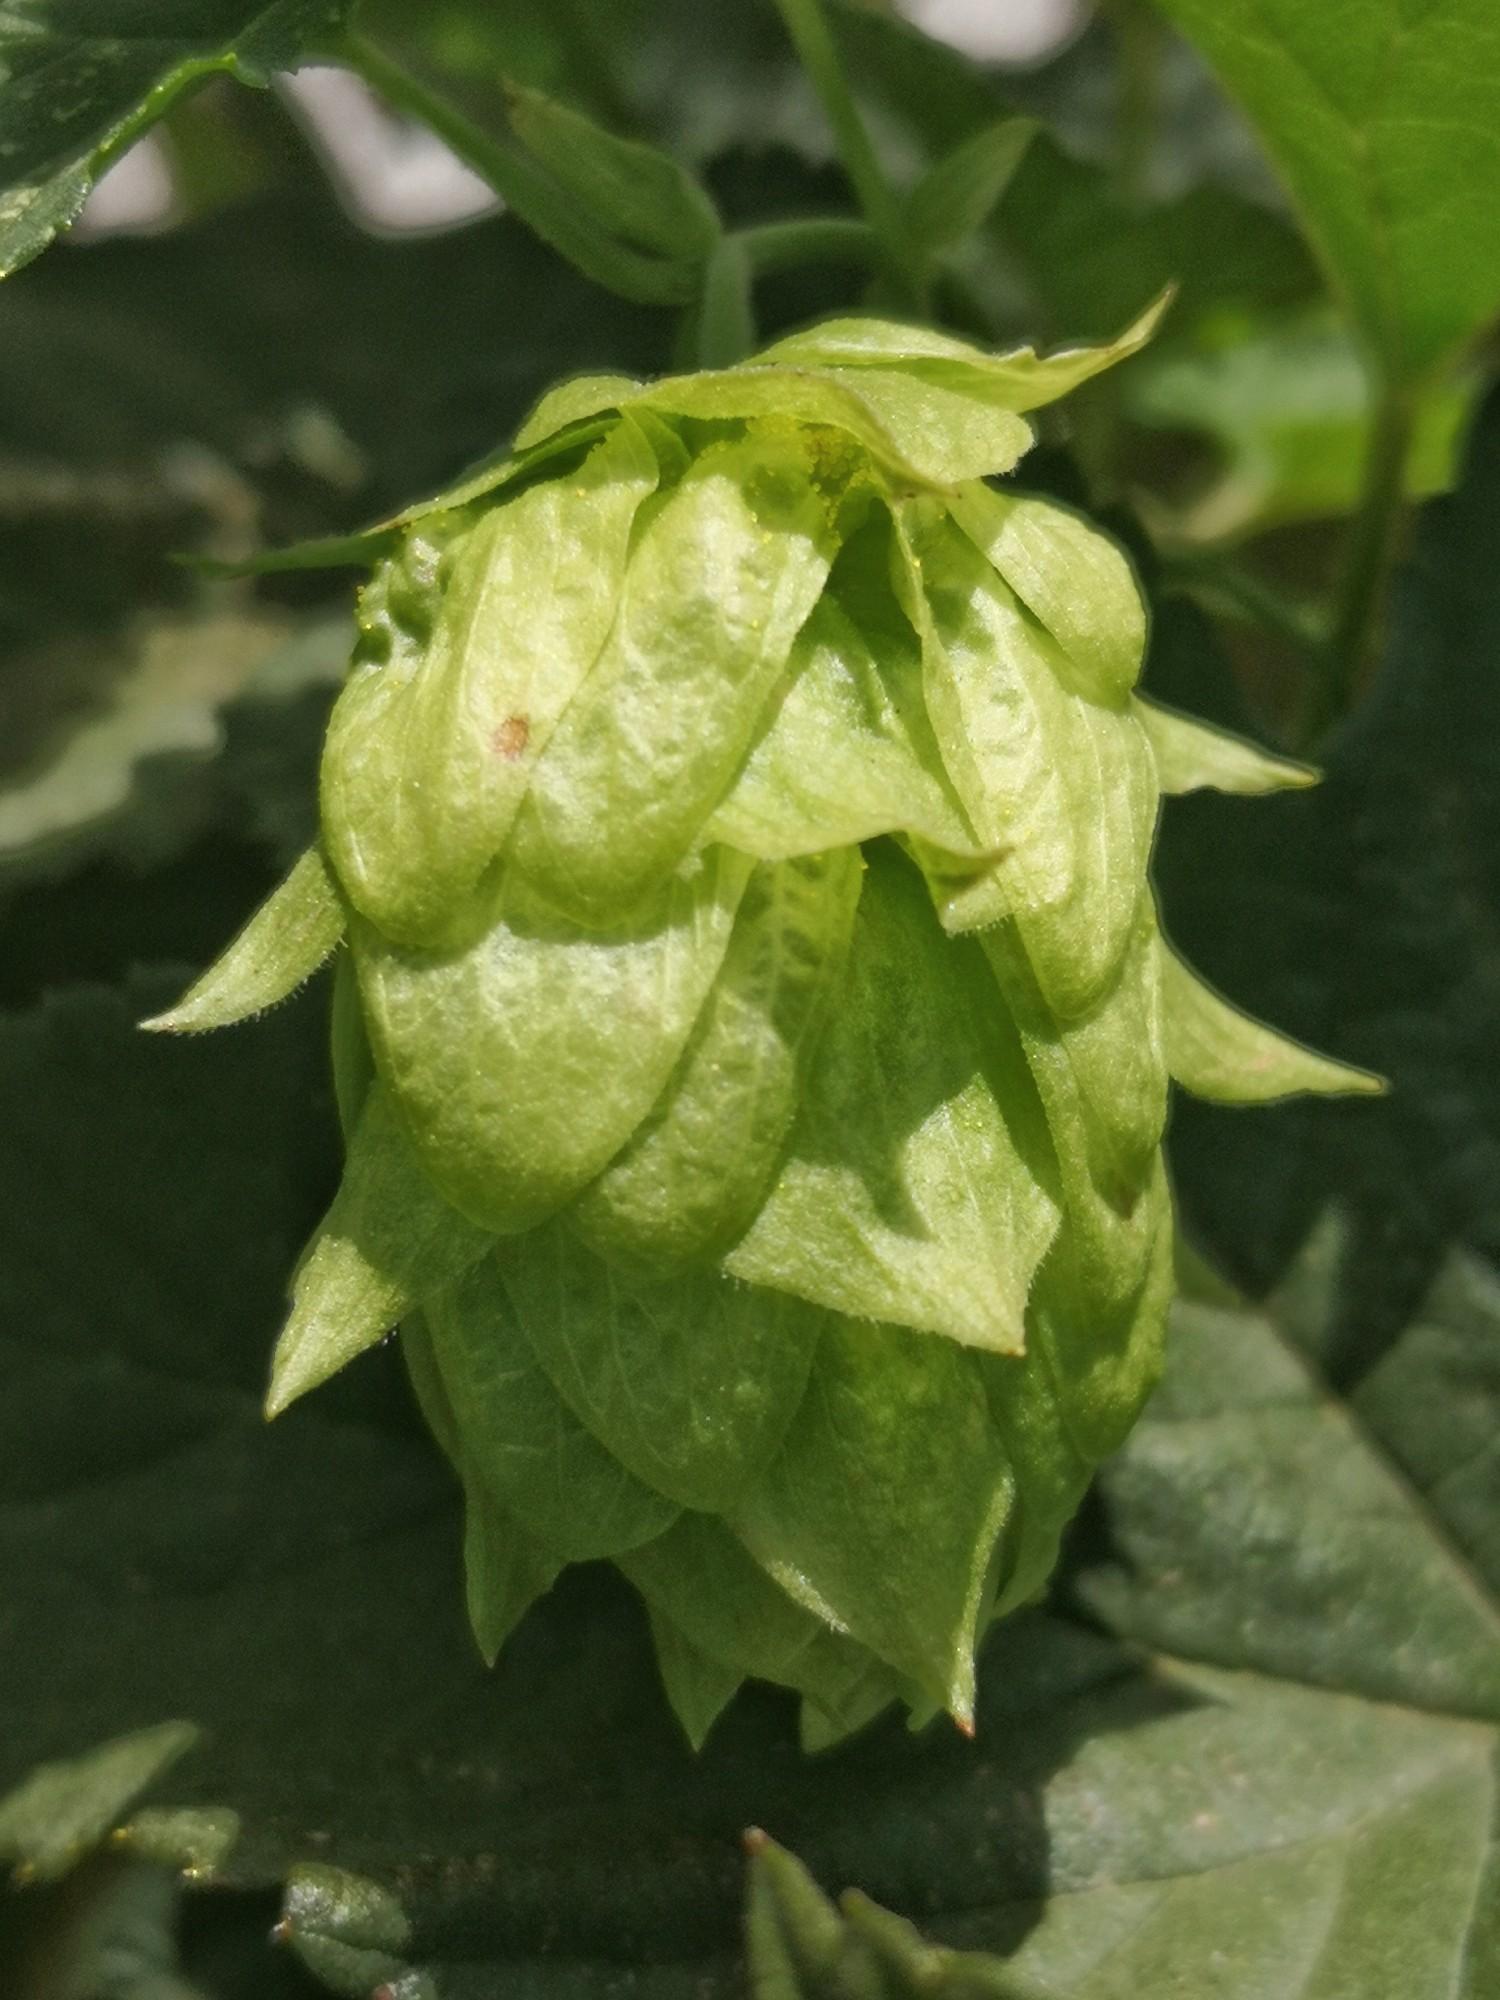 A hops cone.